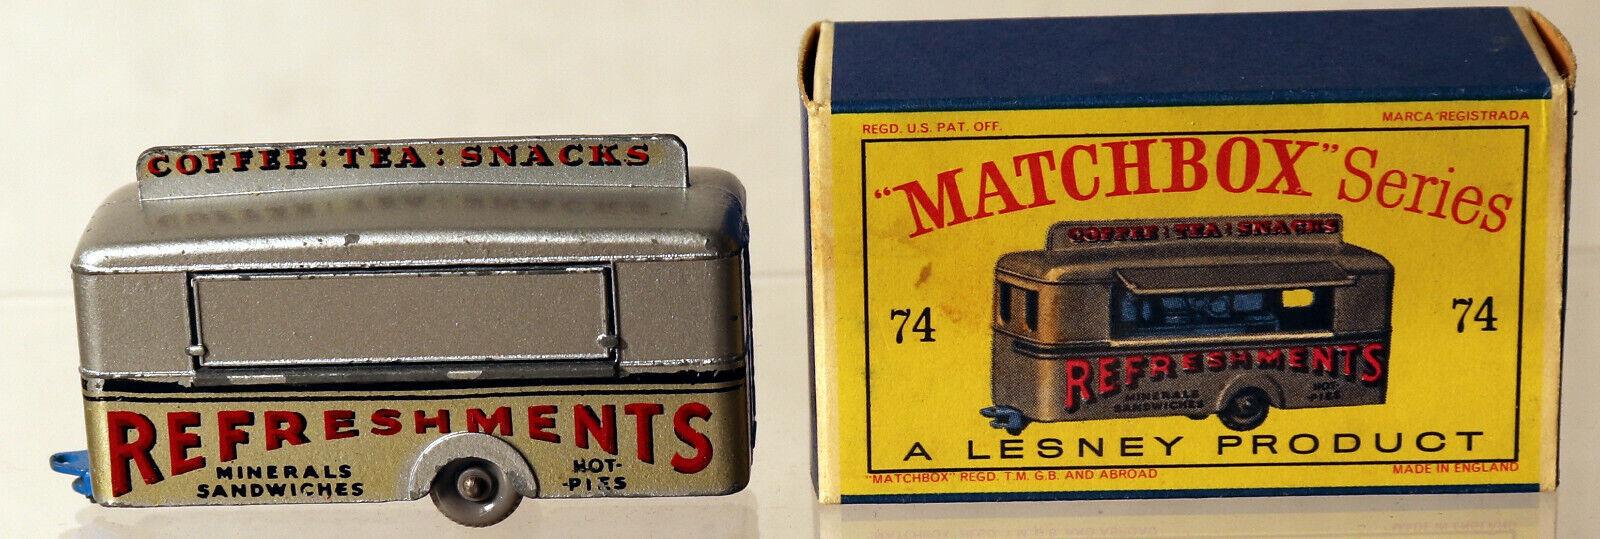 barato y de moda DTE Lesney Matchbox Matchbox Matchbox Ruedas regulares 74-1 Plata móvil refresco FGPW Med Azul  compra en línea hoy